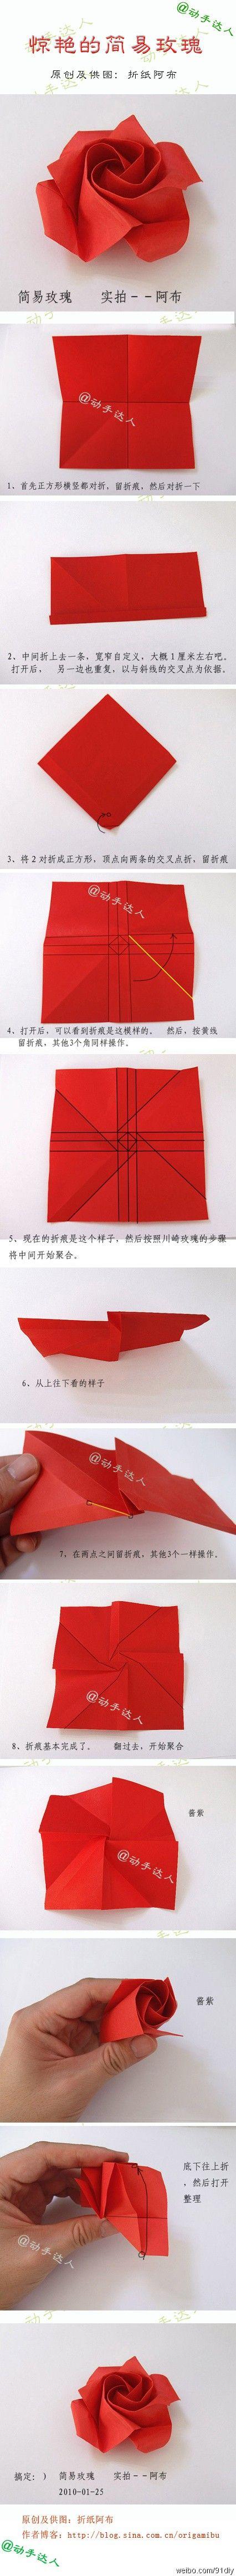 Origami red rose paper flower DIY Tutorial  Valentine's day lovers Easy Cheap Inexpensive gift  Rosa roja flor de papel Papiroflexia facil barata regalo San Valentin enamorados para colocar en paquete de regalo